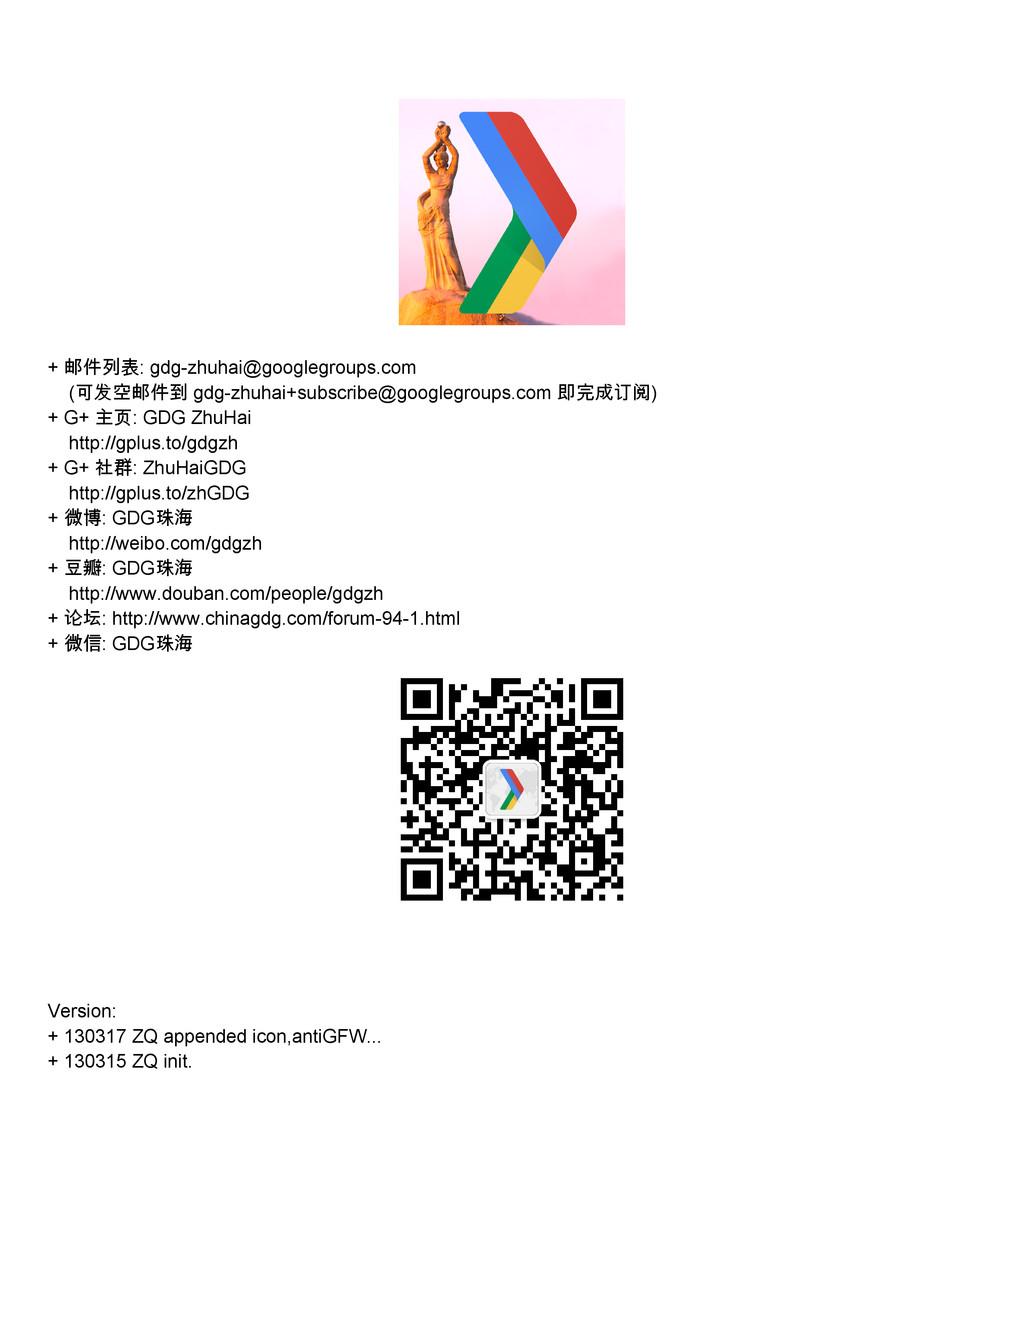 + 邮件列表: gdgzhuhai@googlegroups.com (可发空邮件到 gdg...